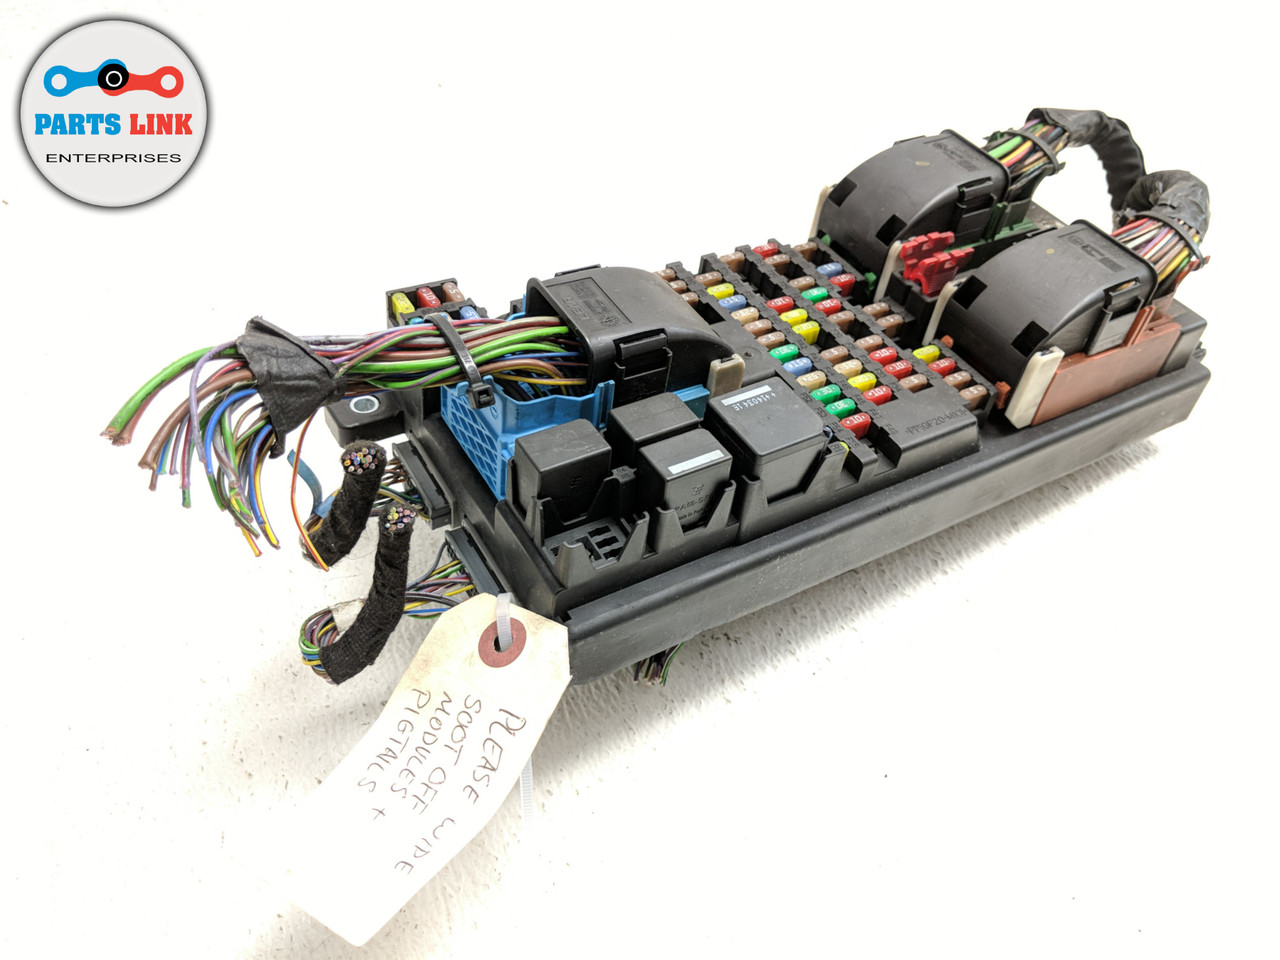 2014-2015 range rover sport l494 right dash board fuse box relay module  terminal  parts link enterprise